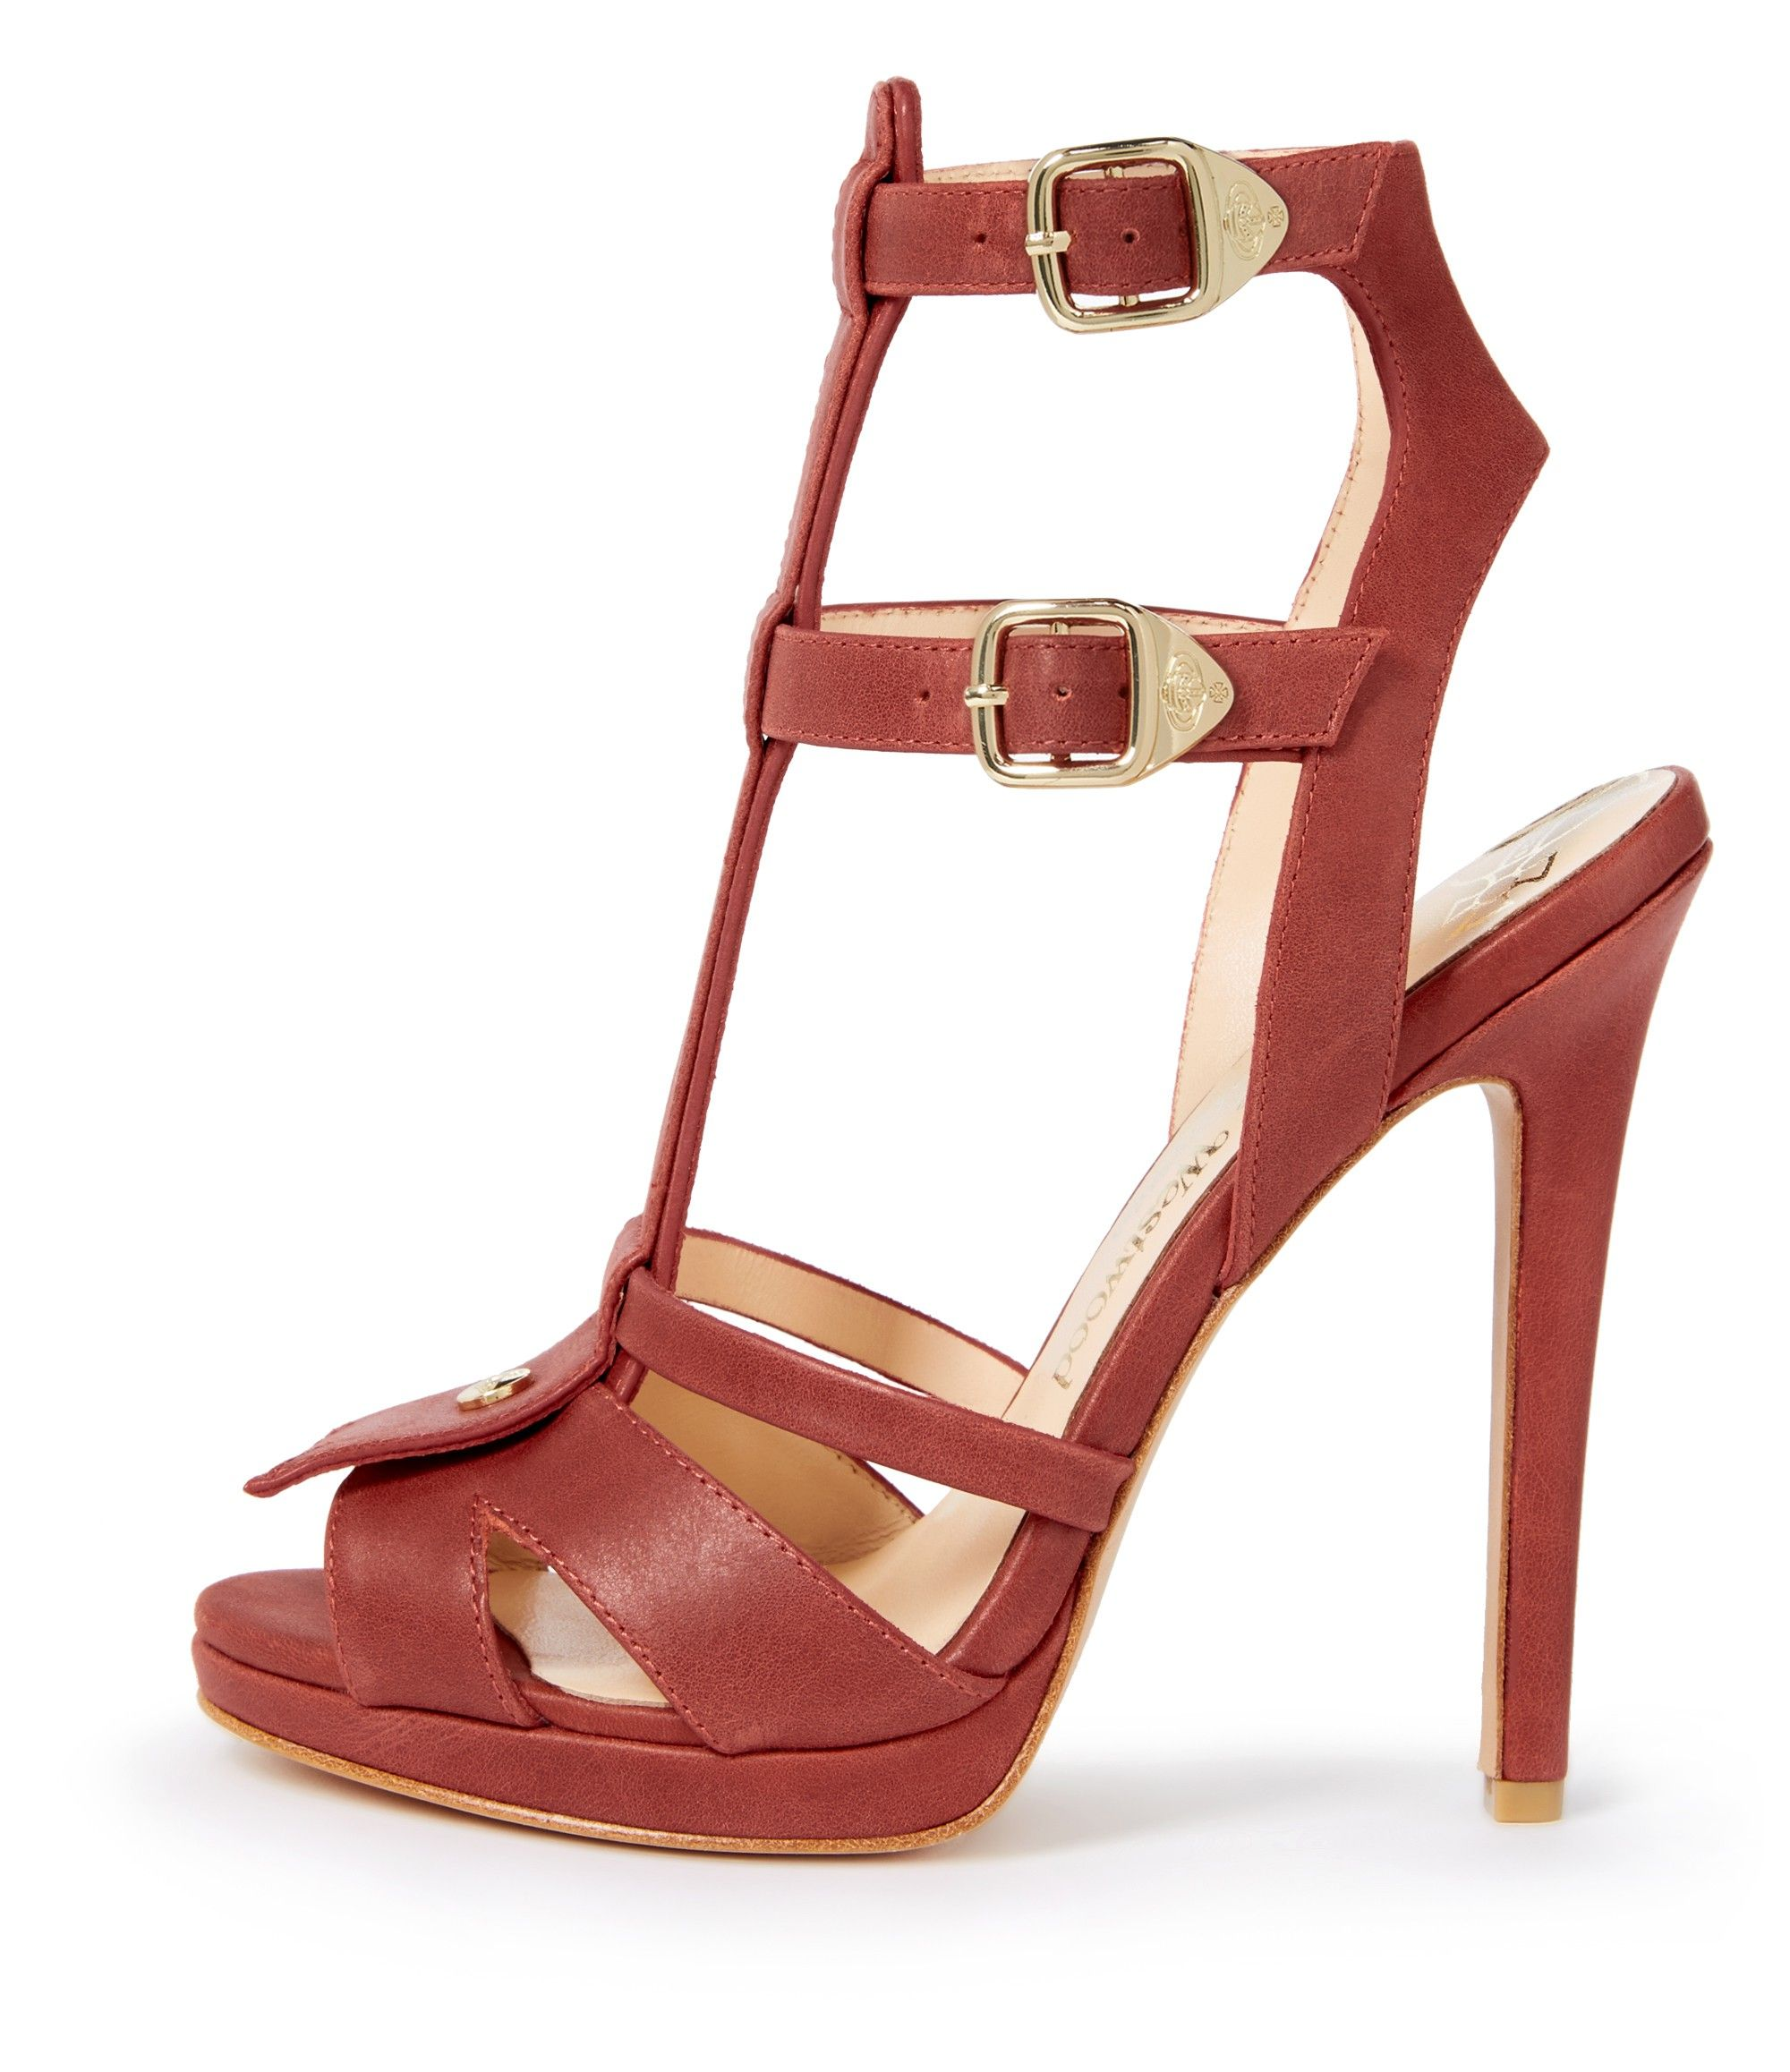 Cavil Heels